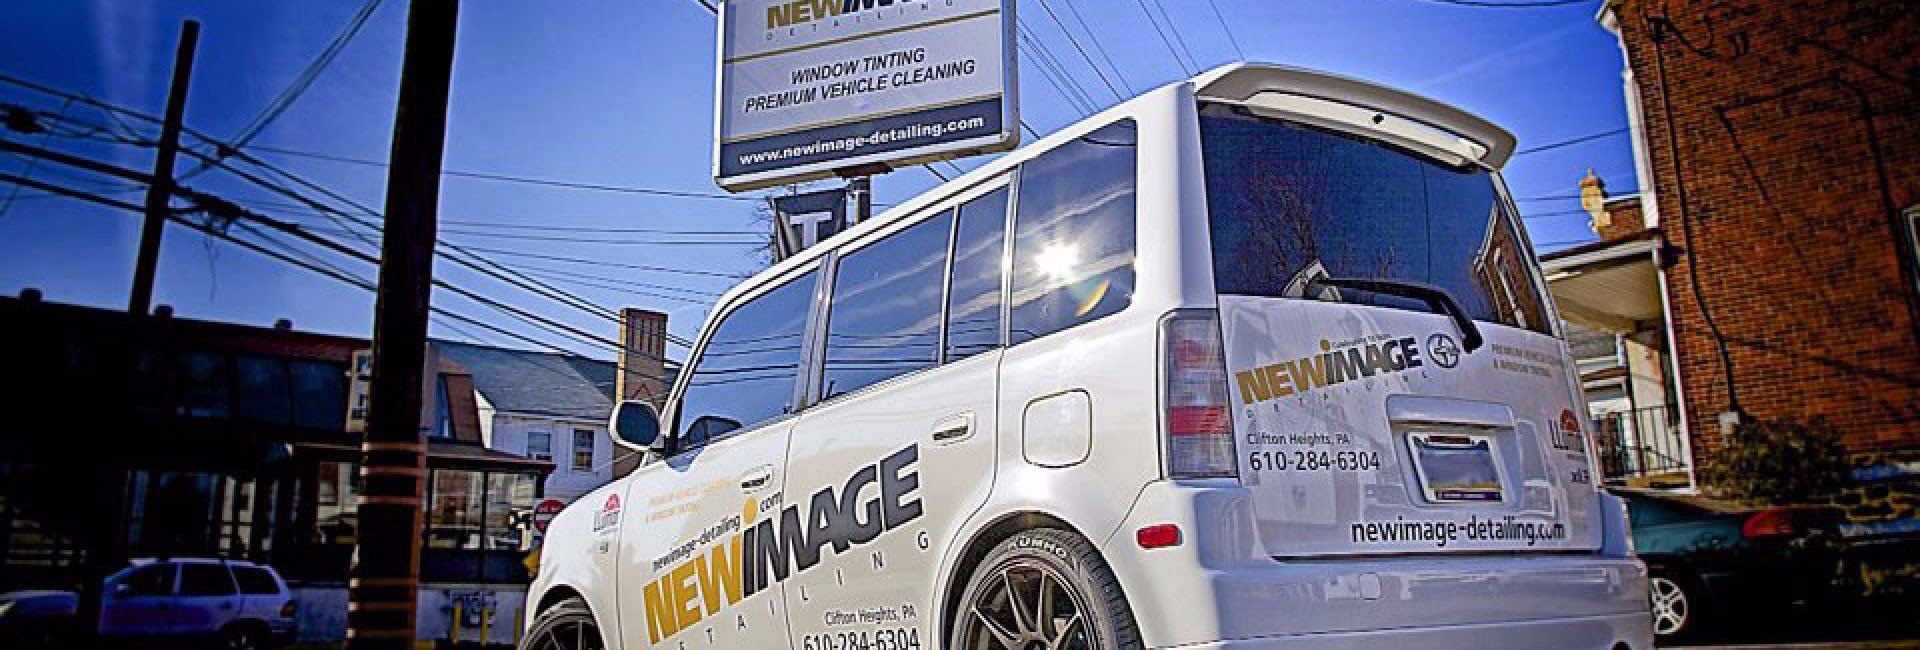 New Image Cars